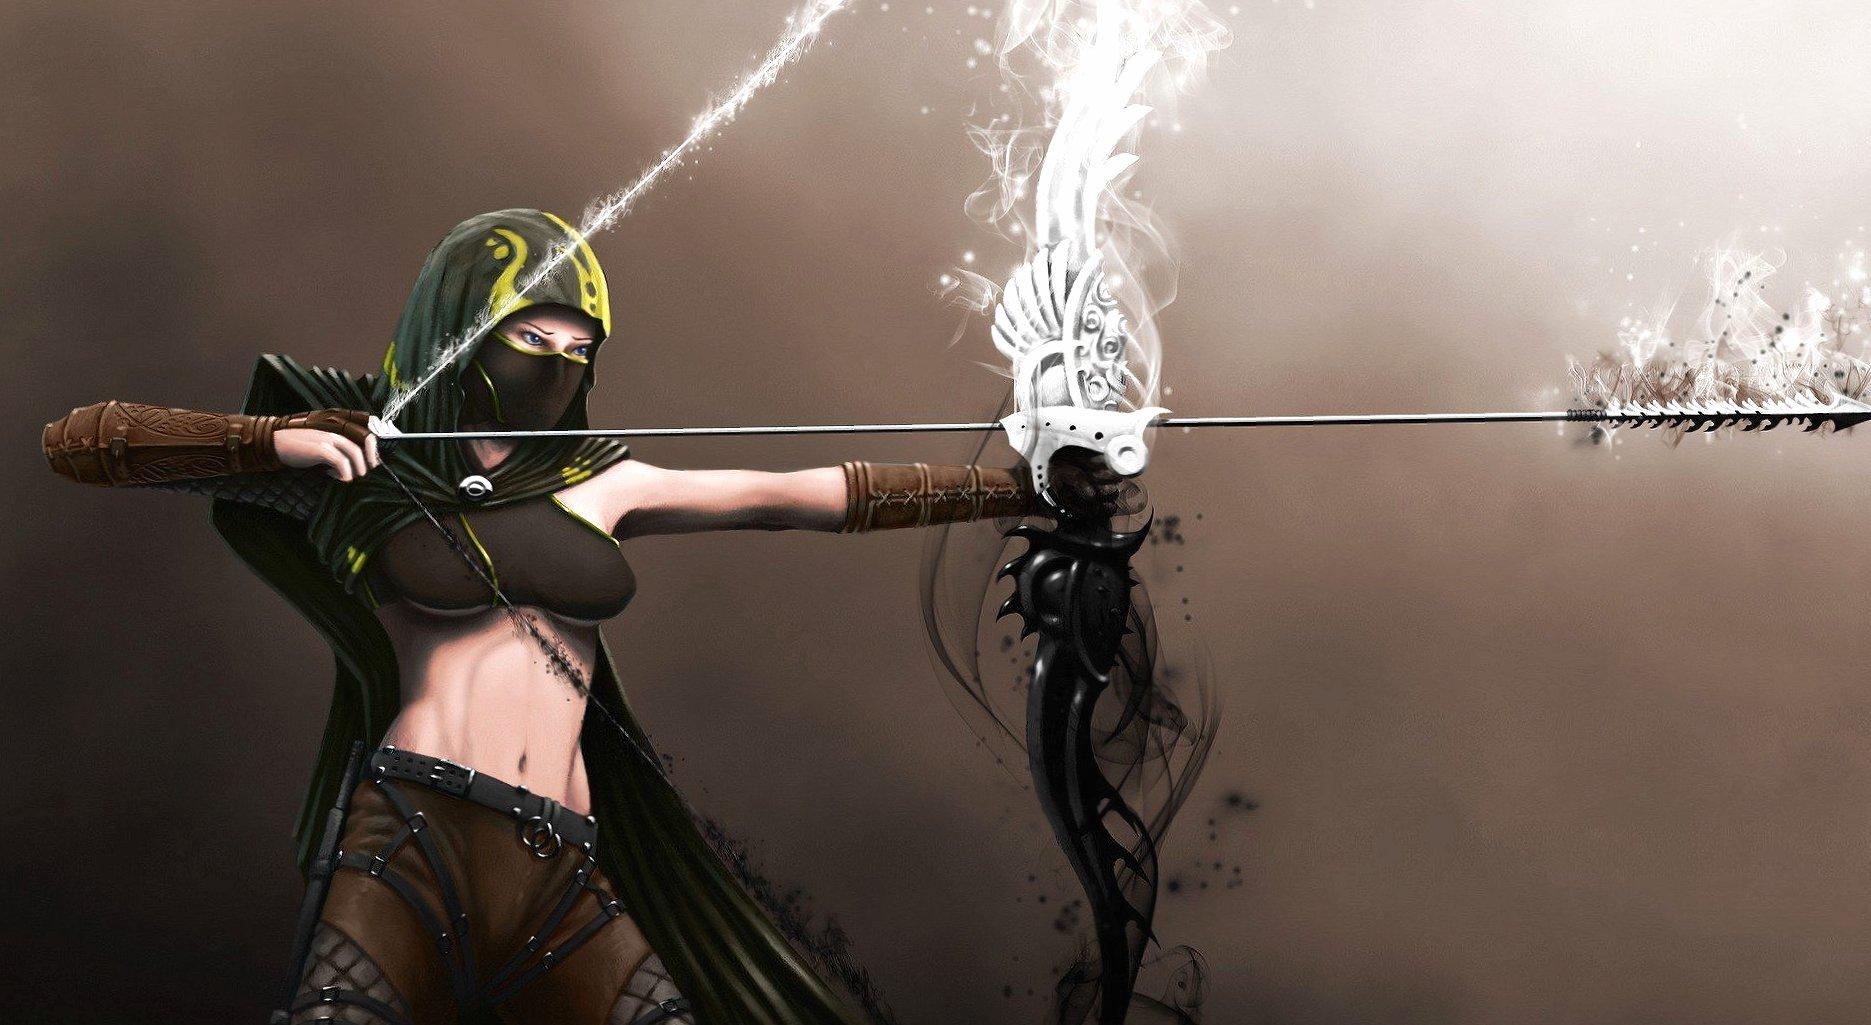 Arcier woman fantasy wallpapers HD quality